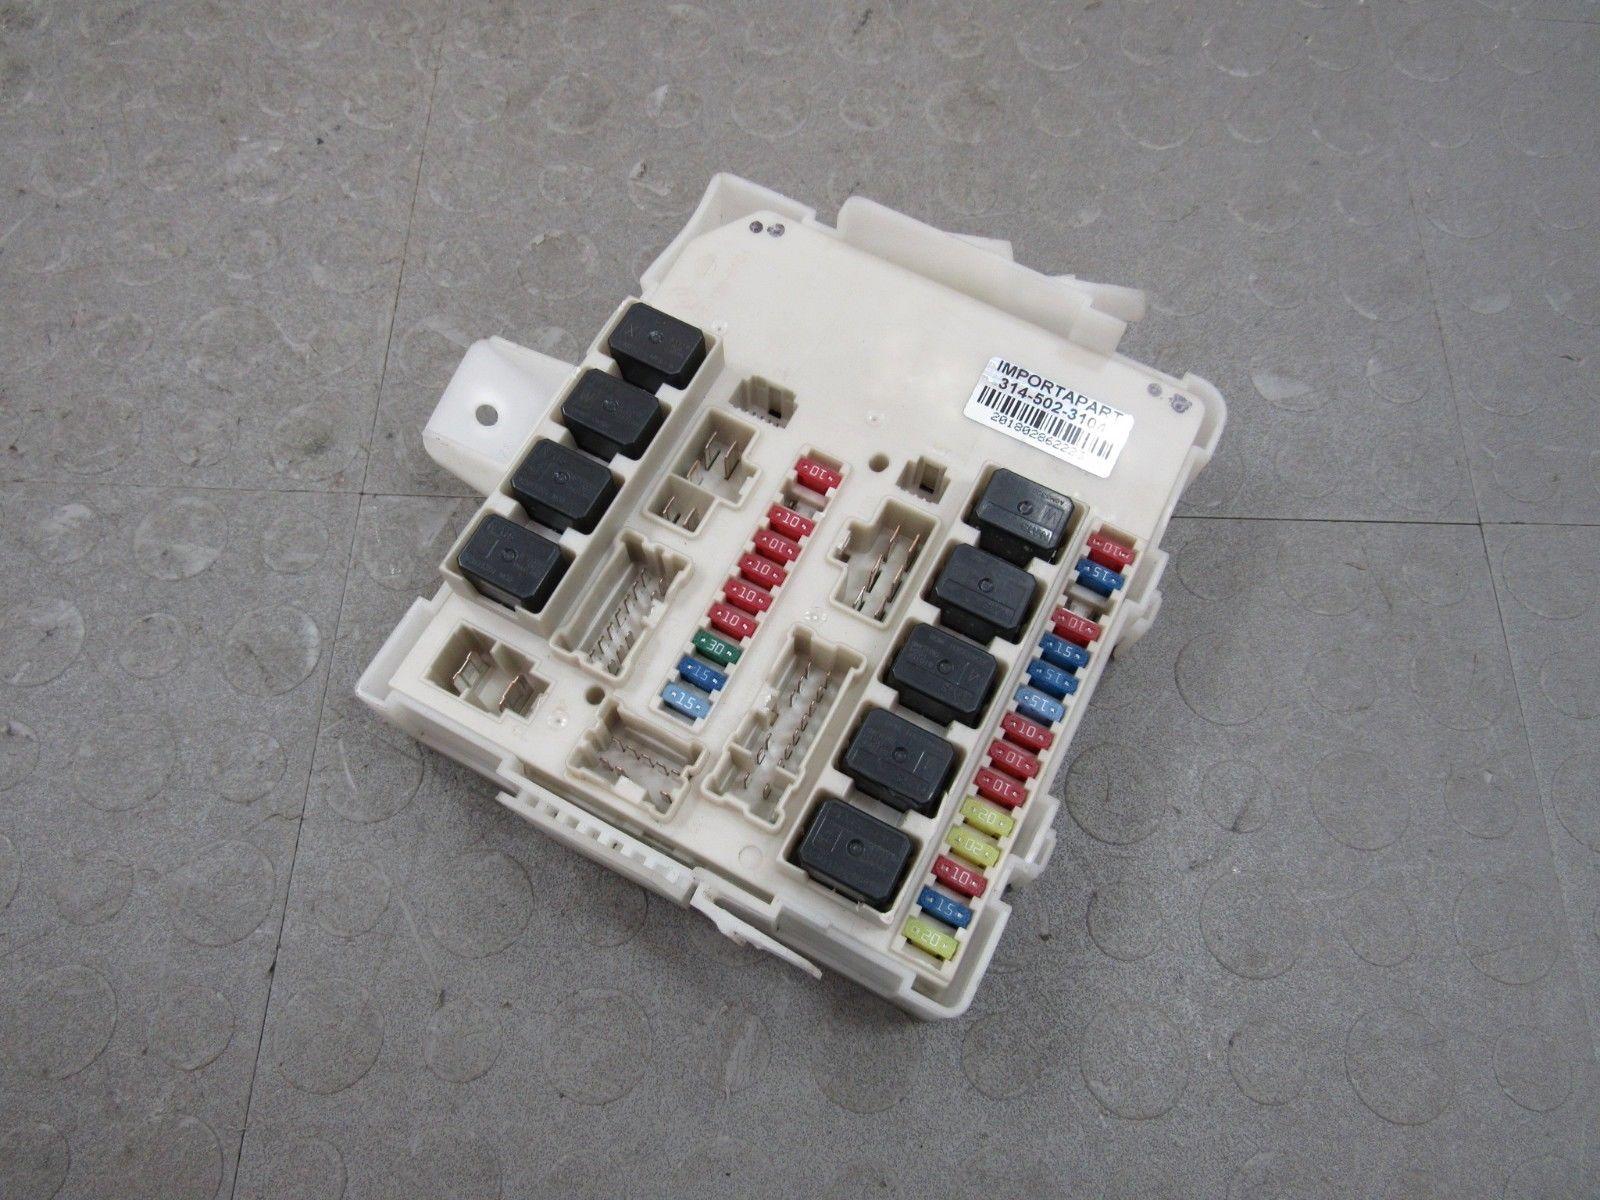 2005 Nissan Xterra Ipdm Diagram Armada Fuse Box Titan Body Module A 1600x1200